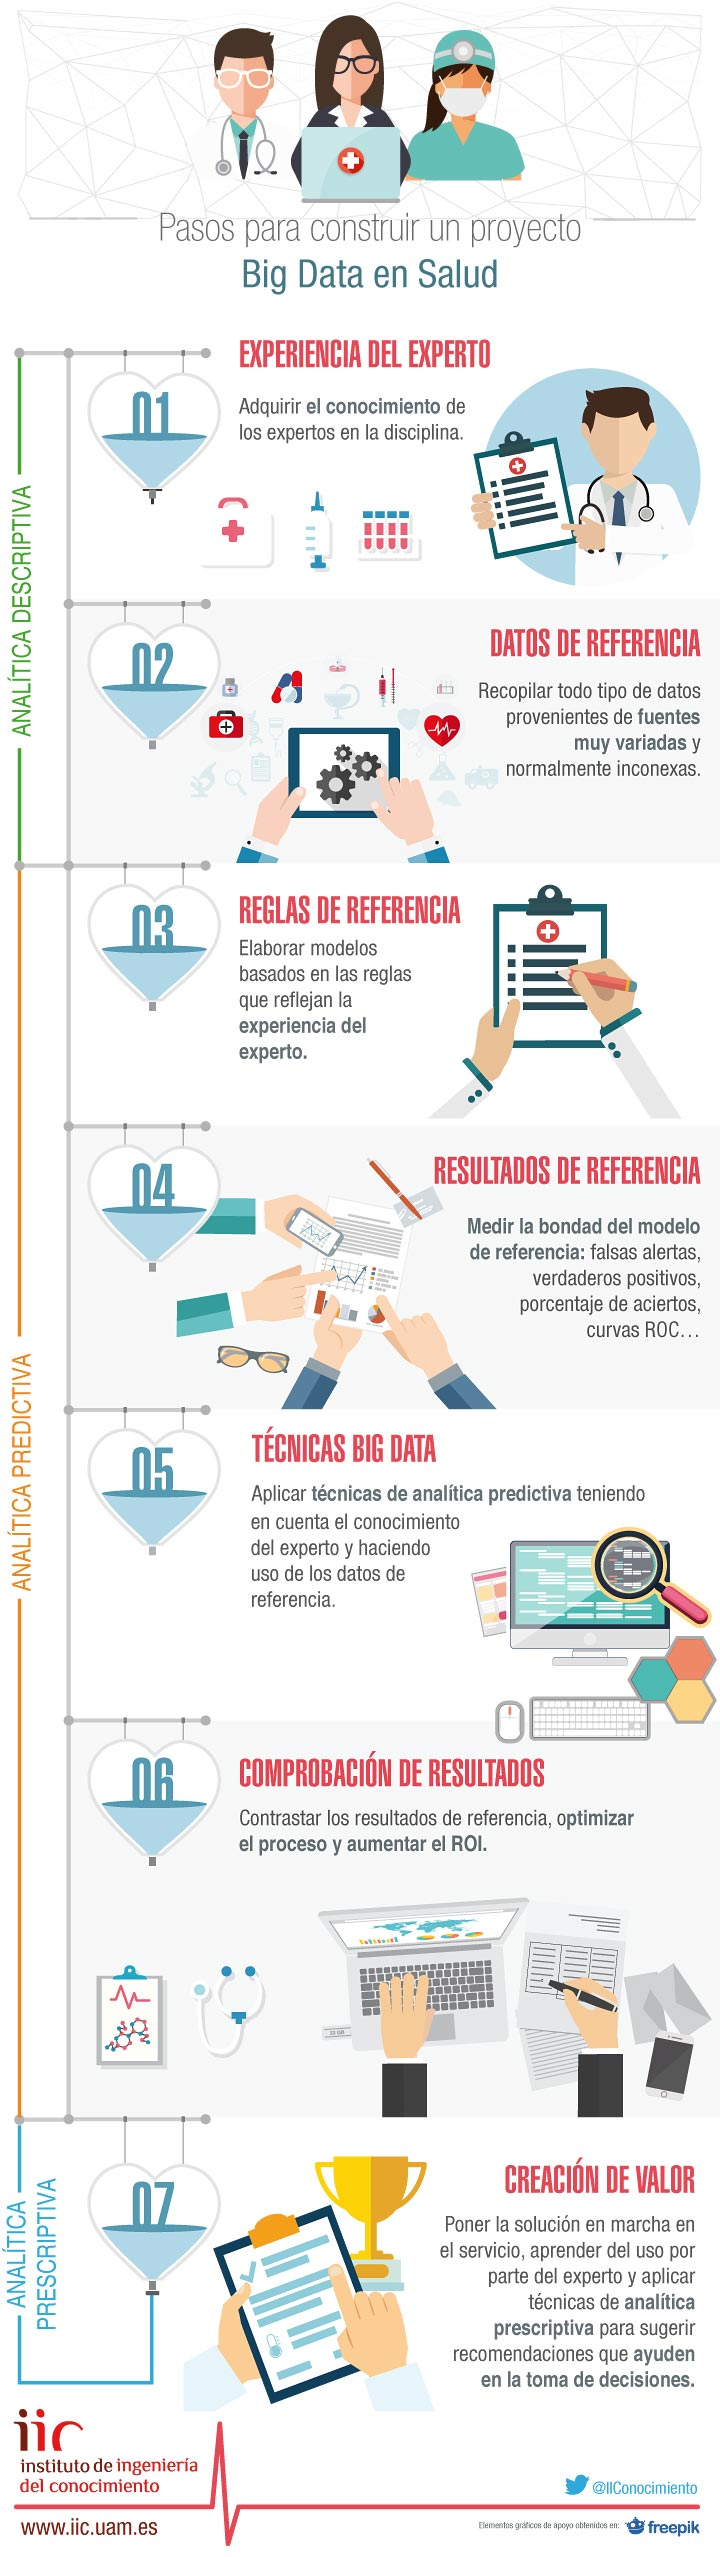 7 Pasos para construir un proyecto Big Data en salud #infografia #infographic #health